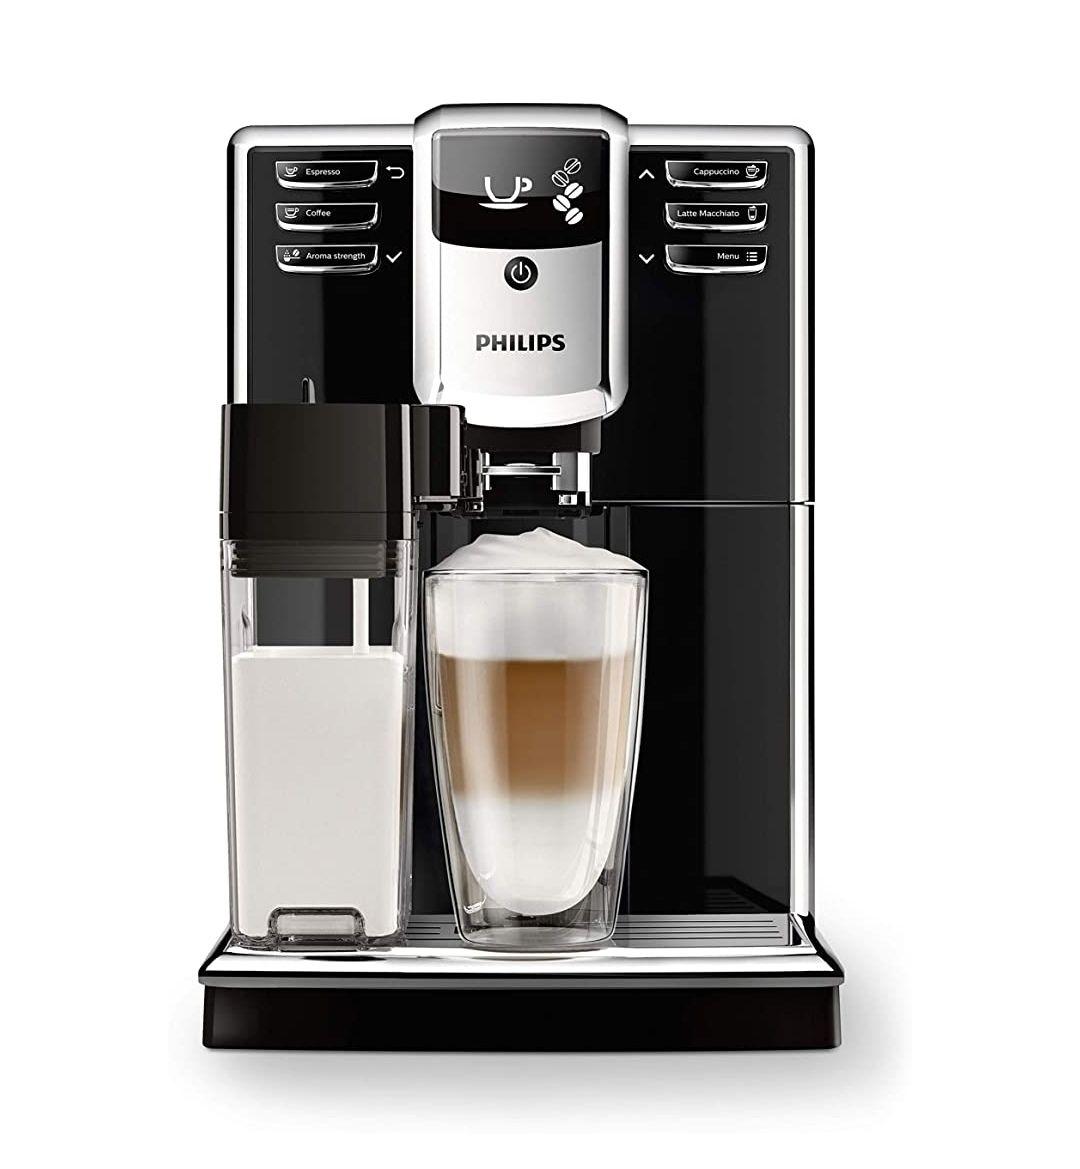 Cafetera superautomática Philips EP5360/10 Serie 5000